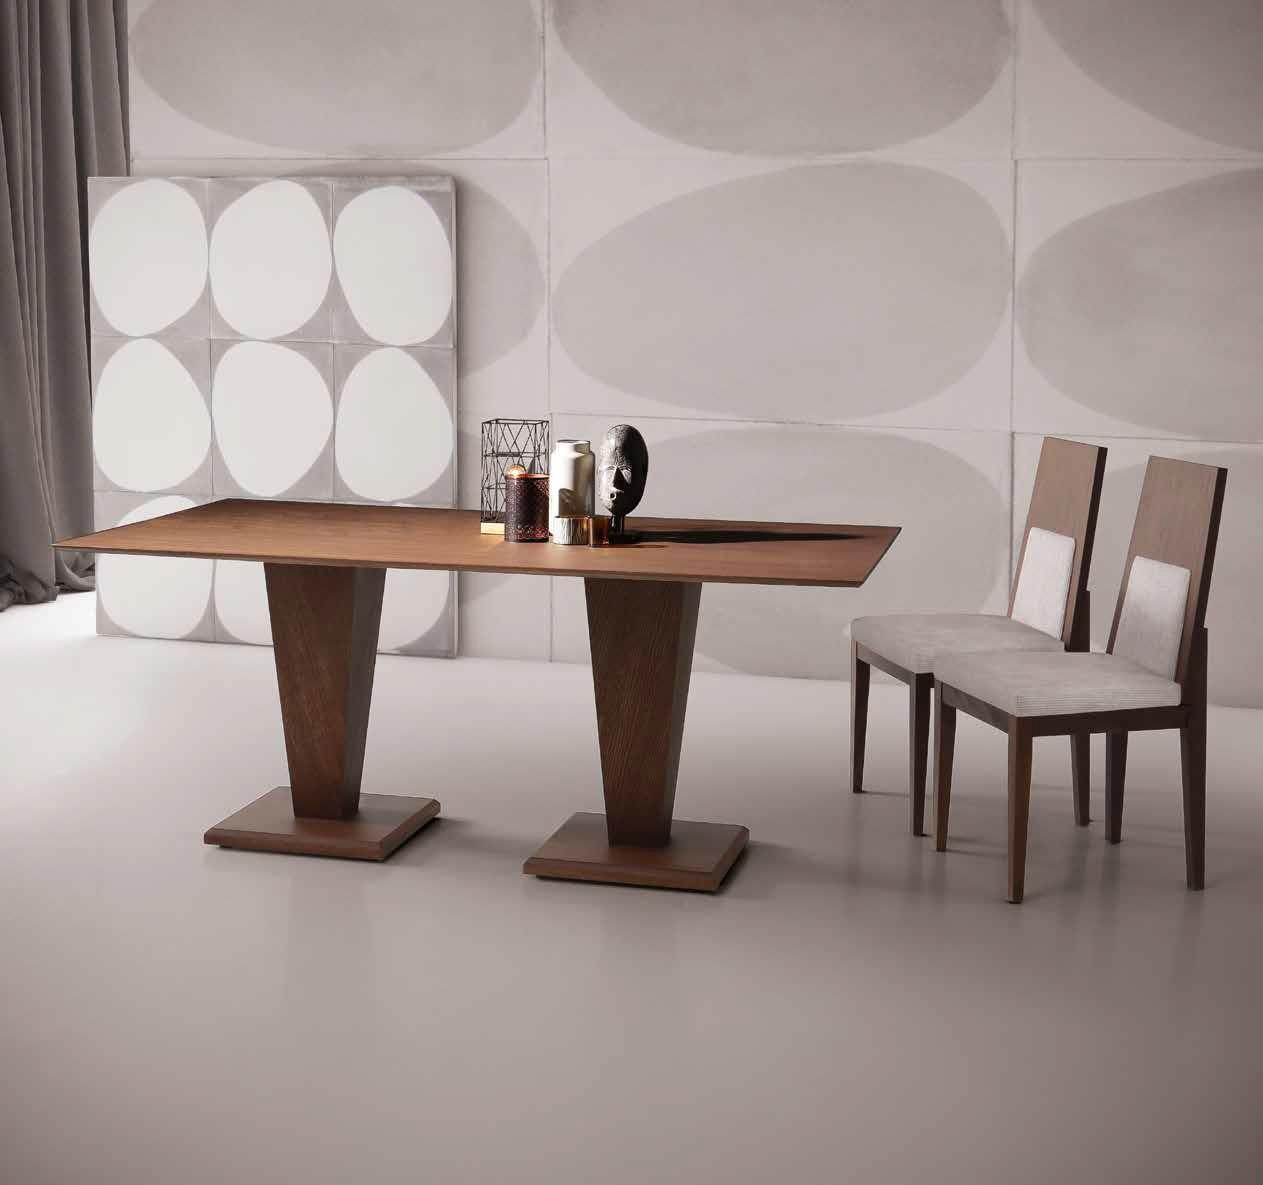 Mesa muebles d azmuebles d az for Mesas de comedor rusticas